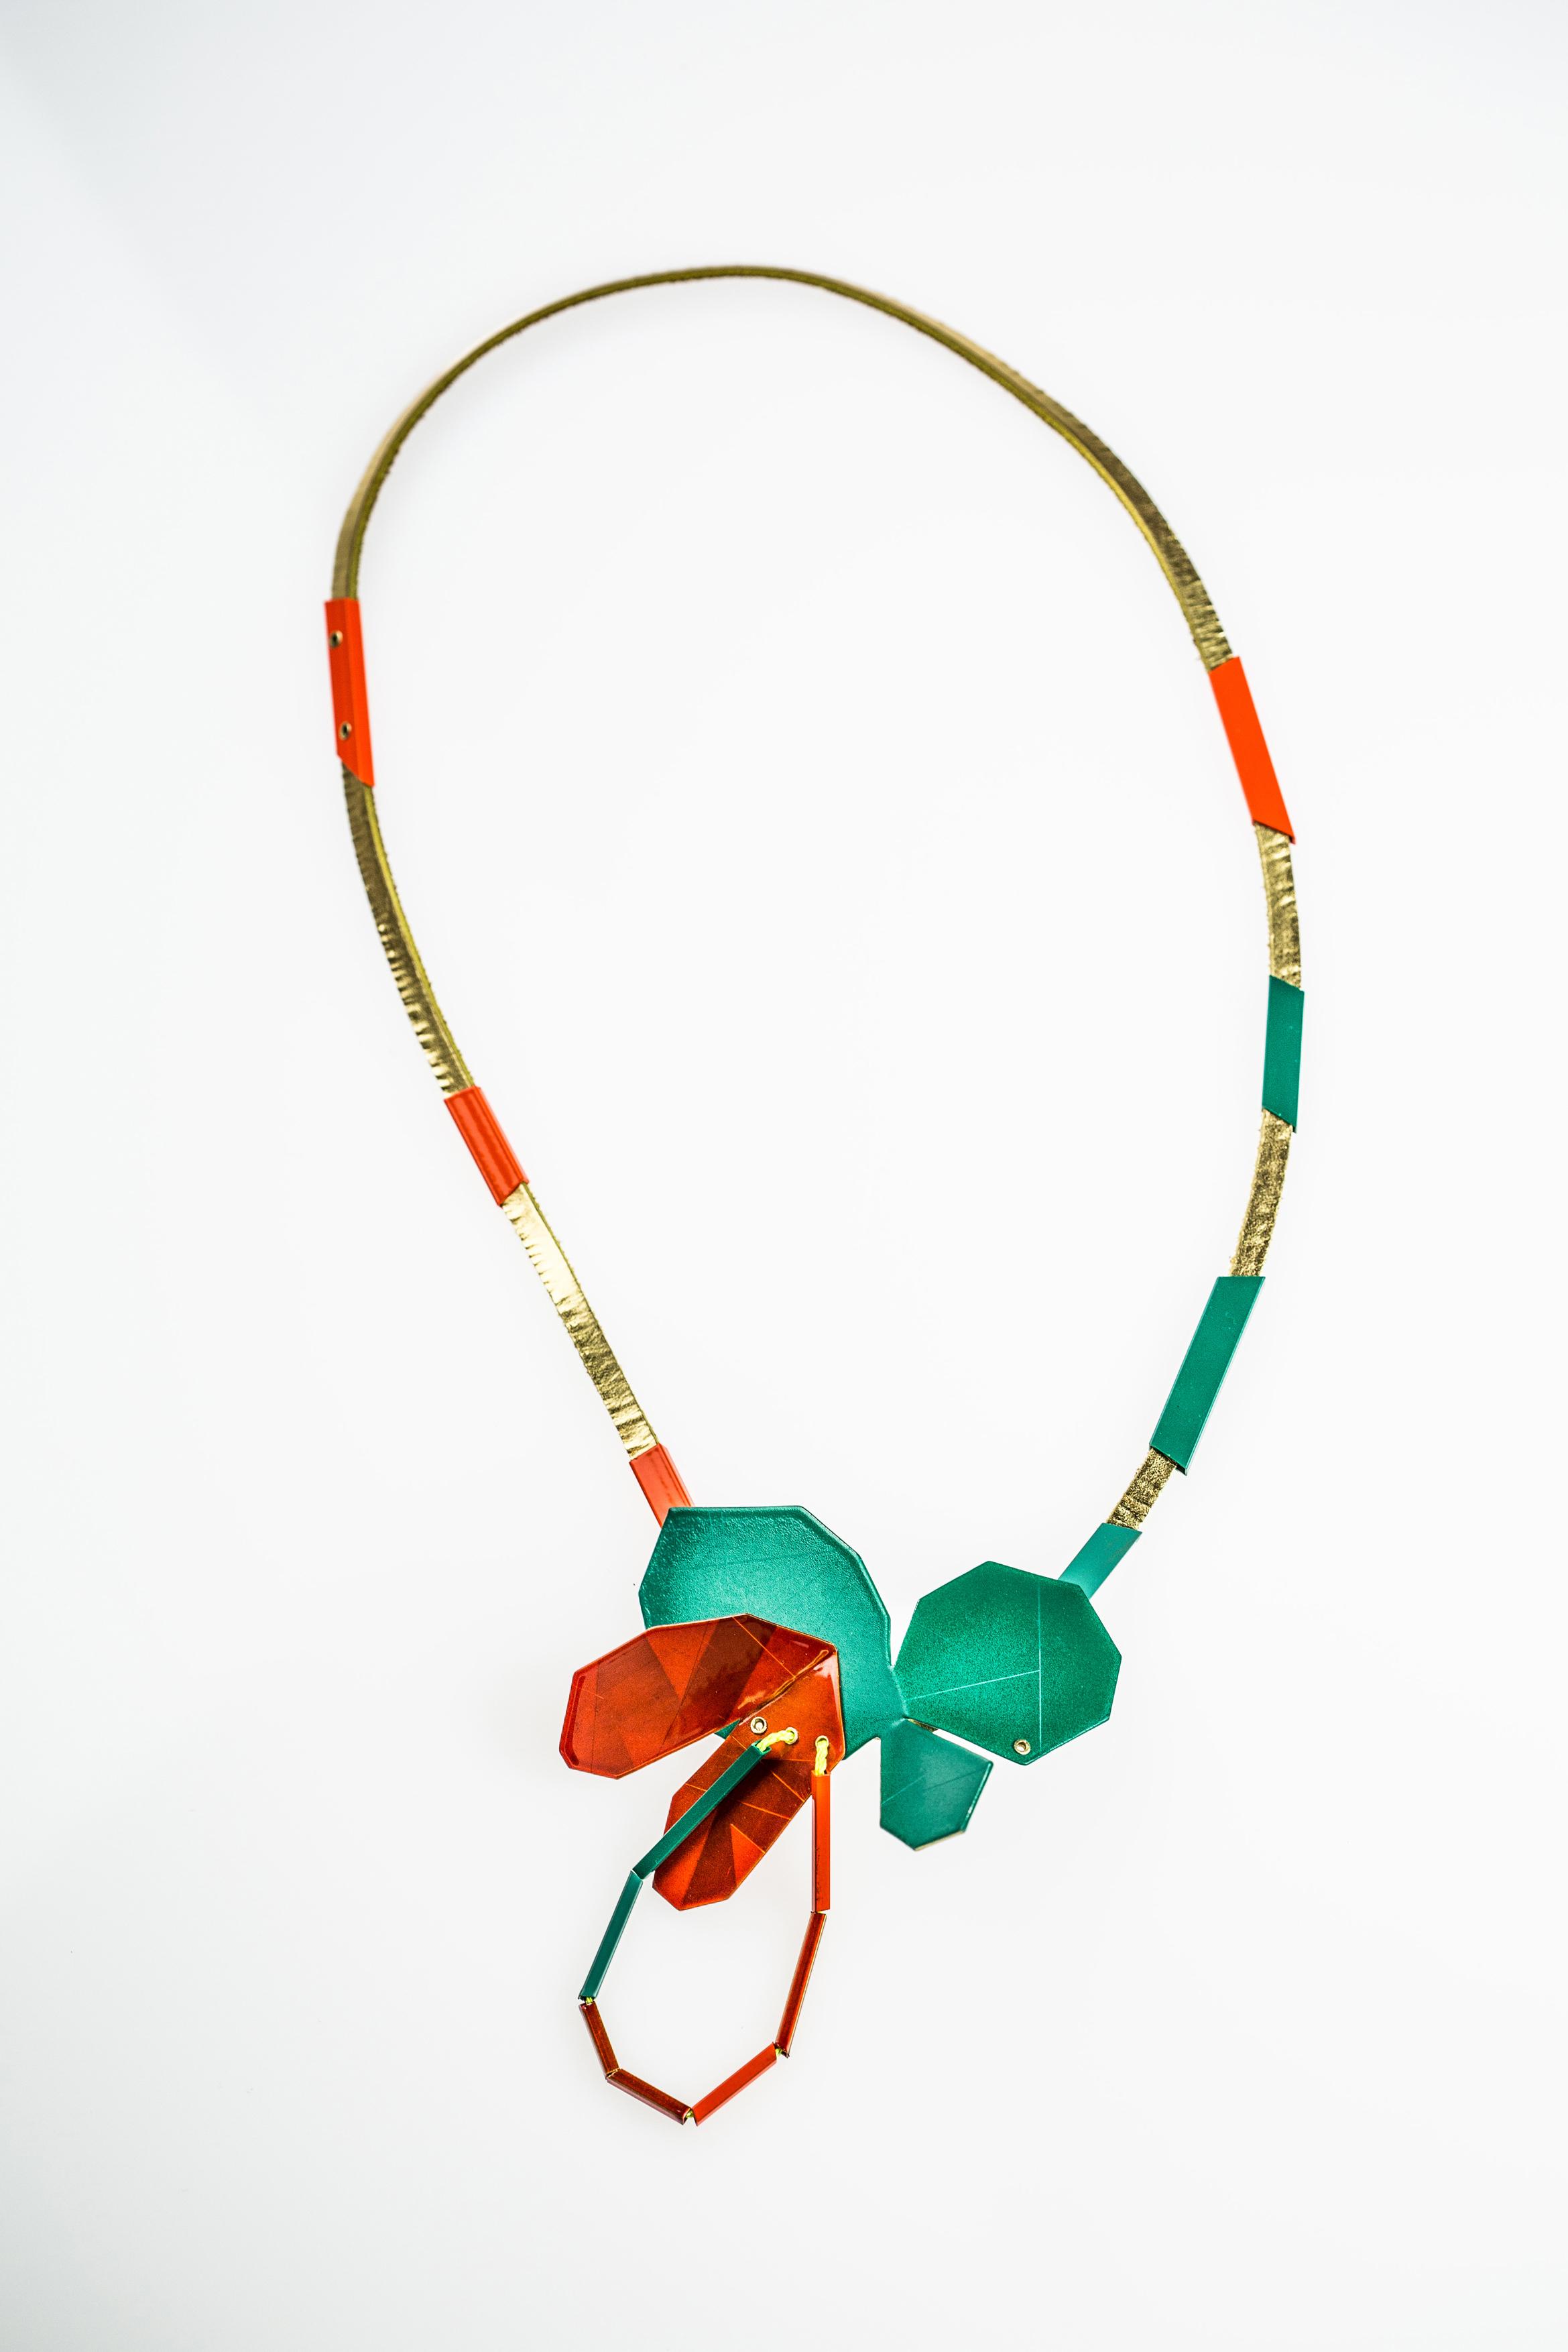 7 Gems and Loop Necklace_Voegele.jpg